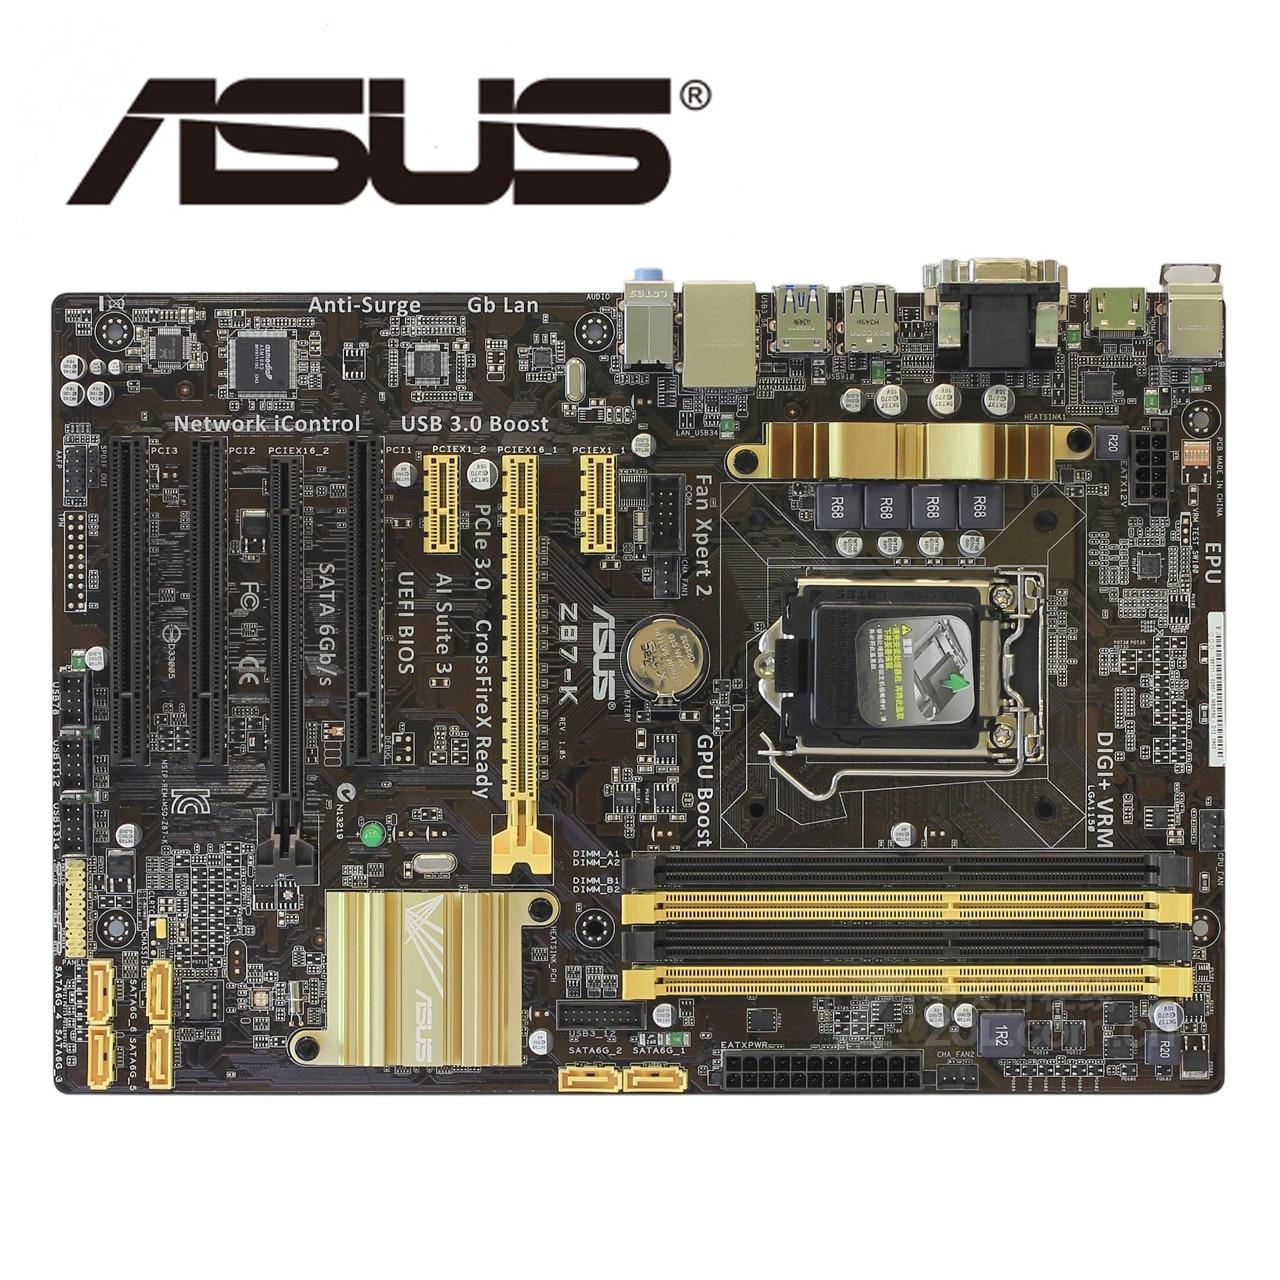 LGA1150 DDR3 Z87 For ASUS Z87-k 100% Original Motherboard32G Z87K Desktop Mainboard Mother board USB3.0 SATA III VGA OC UsedLGA1150 DDR3 Z87 For ASUS Z87-k 100% Original Motherboard32G Z87K Desktop Mainboard Mother board USB3.0 SATA III VGA OC Used